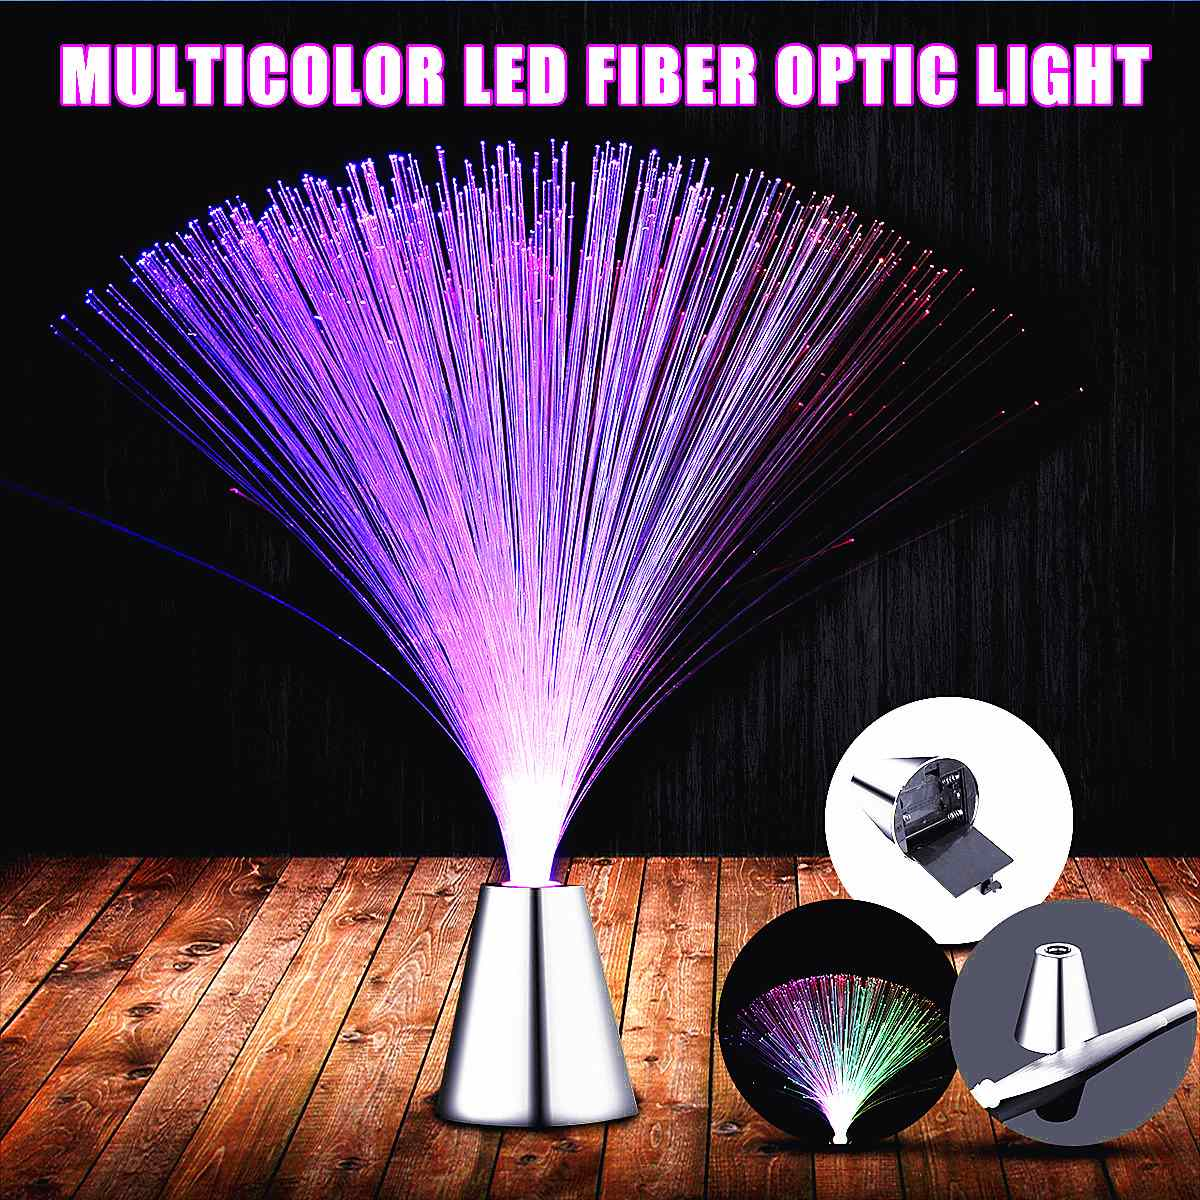 claite-multicolor-led-optic-fiber-light-stand-night-light-lamp-for-interior-decoration-centerpiece-children-holiday-wedding-gift